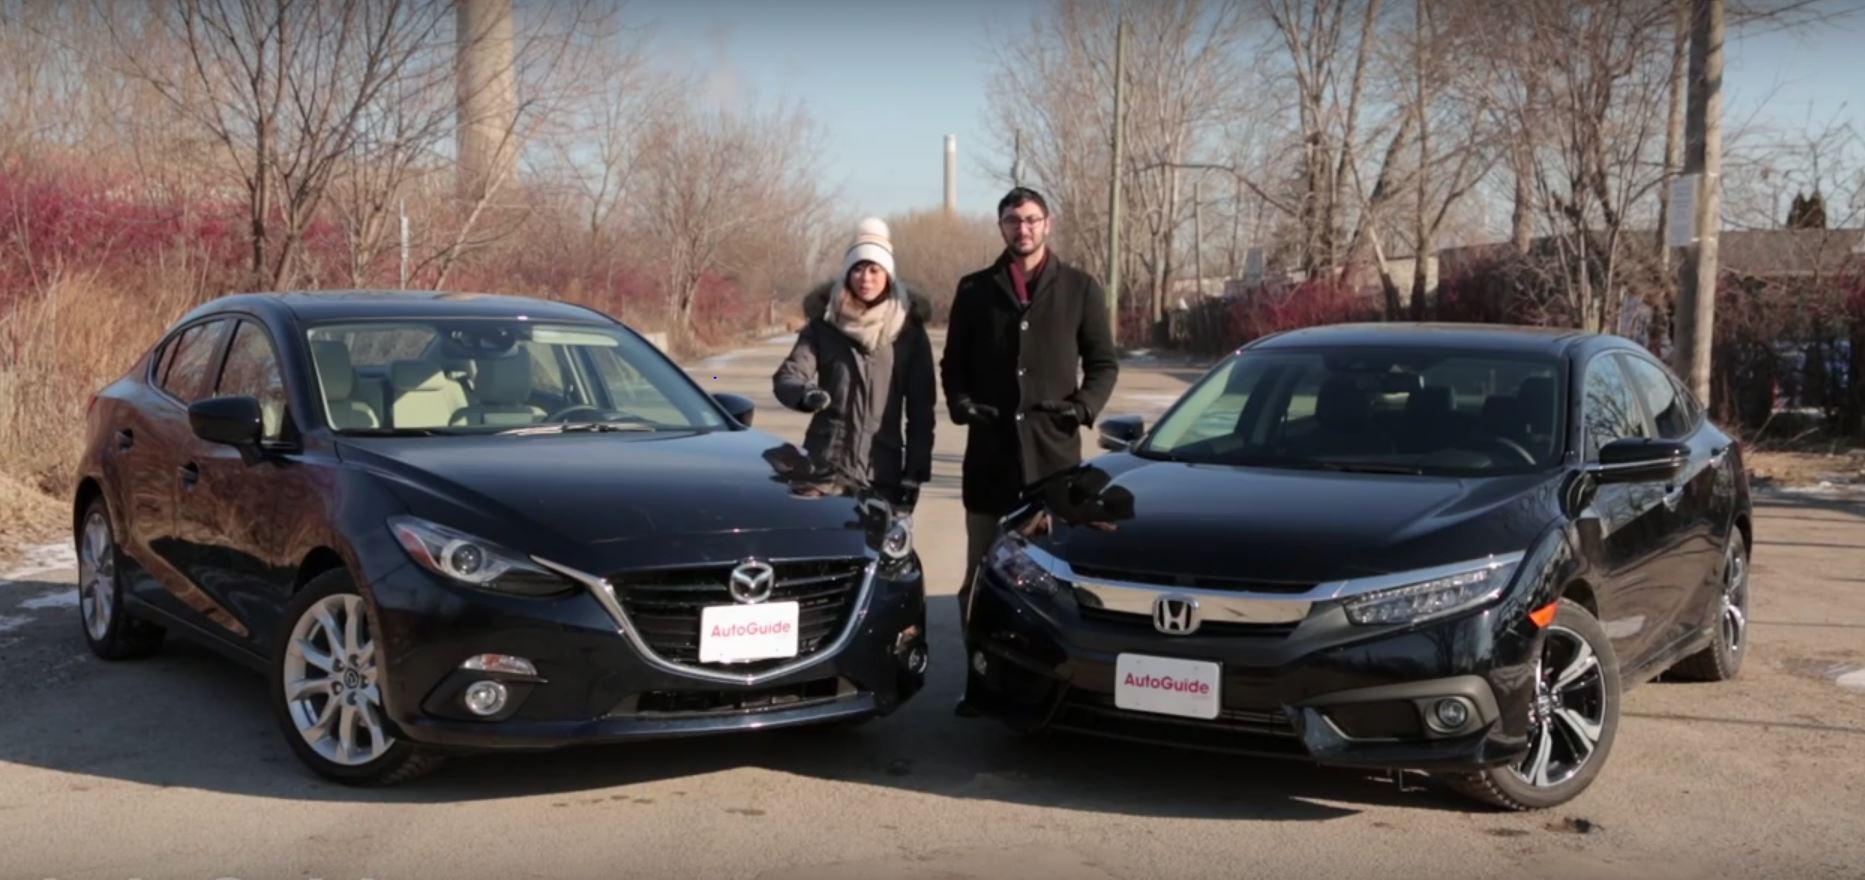 2016 Mazda3 Vs 2016 Honda Civic Who Will Win The War Of